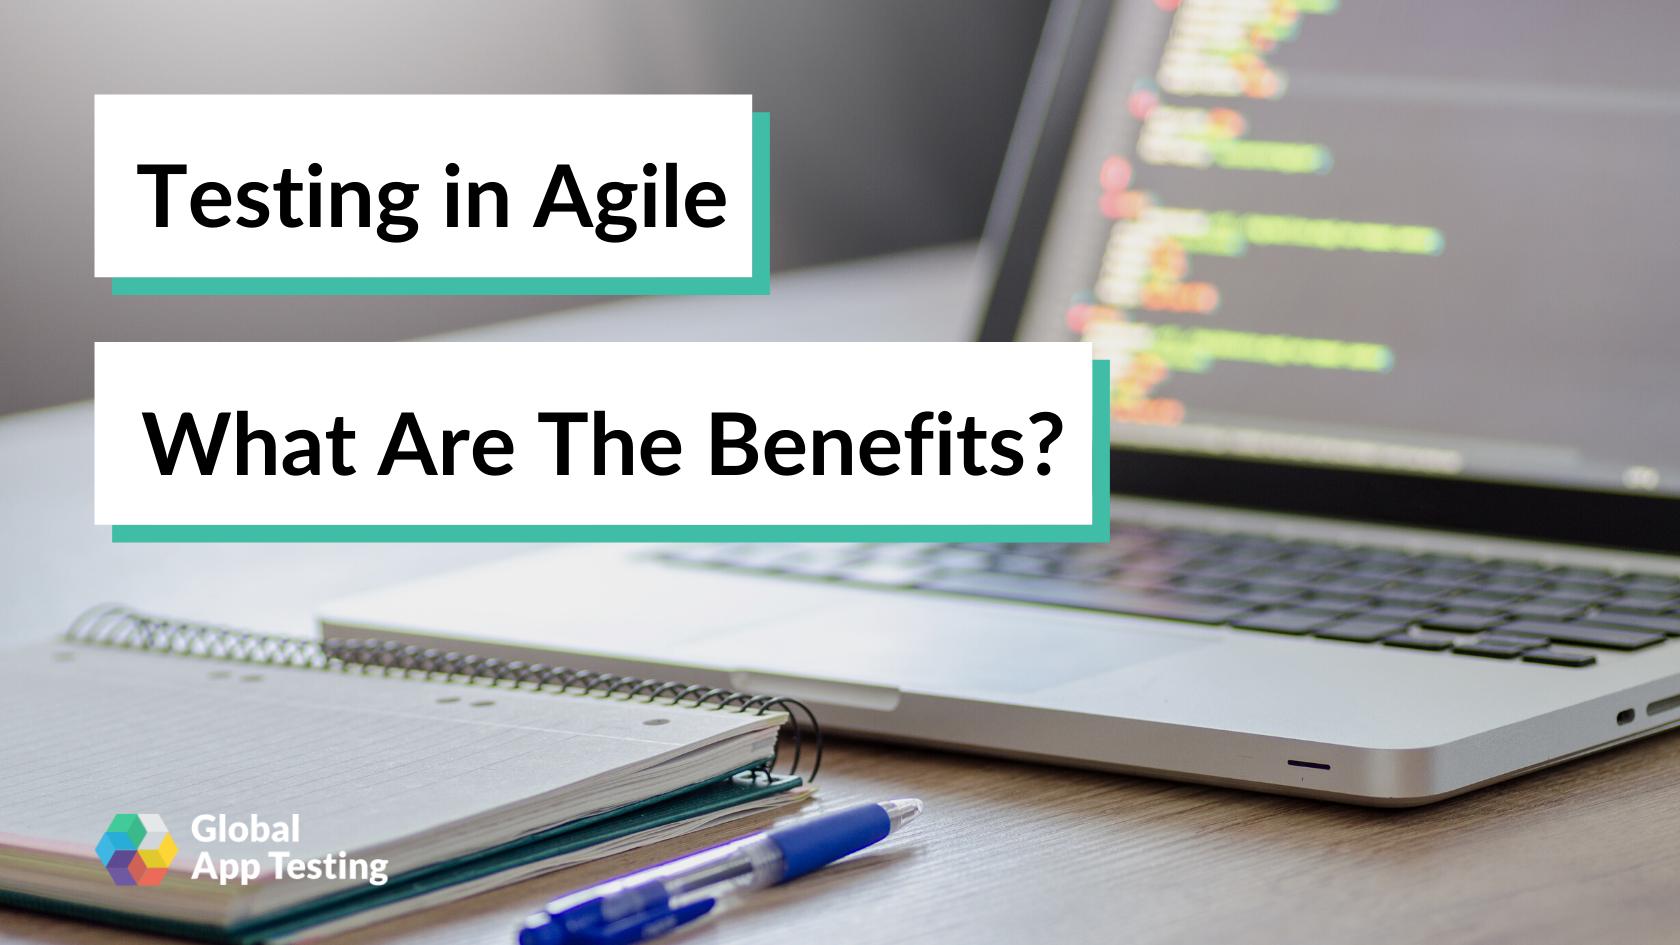 Agile Testing Benefits